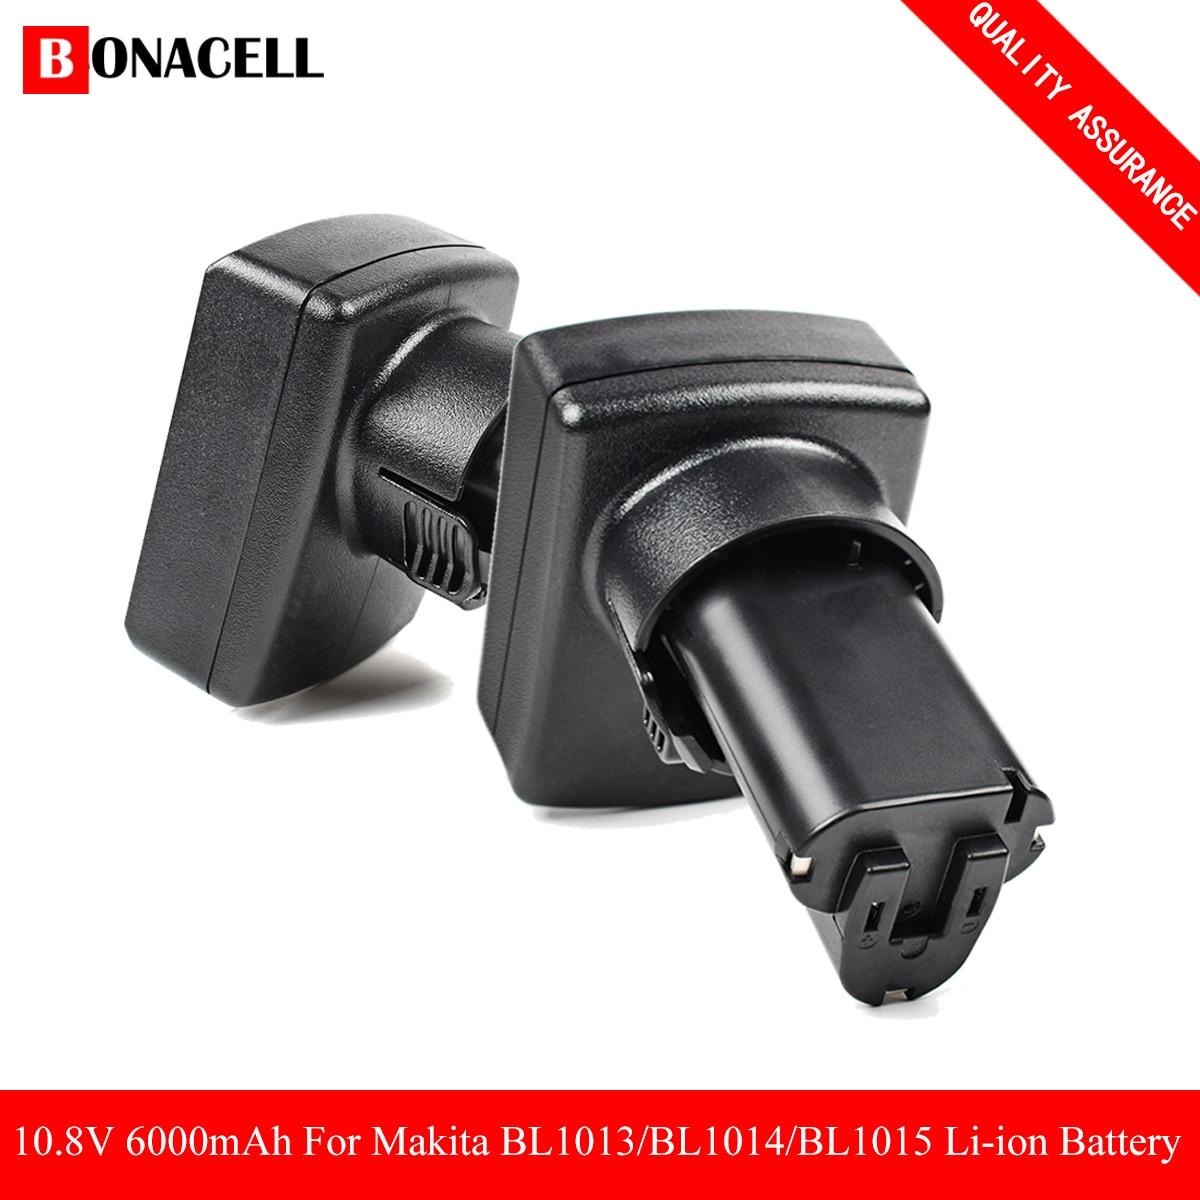 bonacell 10.8V 6000mAh Lithium Battery for Makita BL1013 TD090D TD090DW LCT203W LCT204 194550-6 & 4.0ah & 3.0ah L70